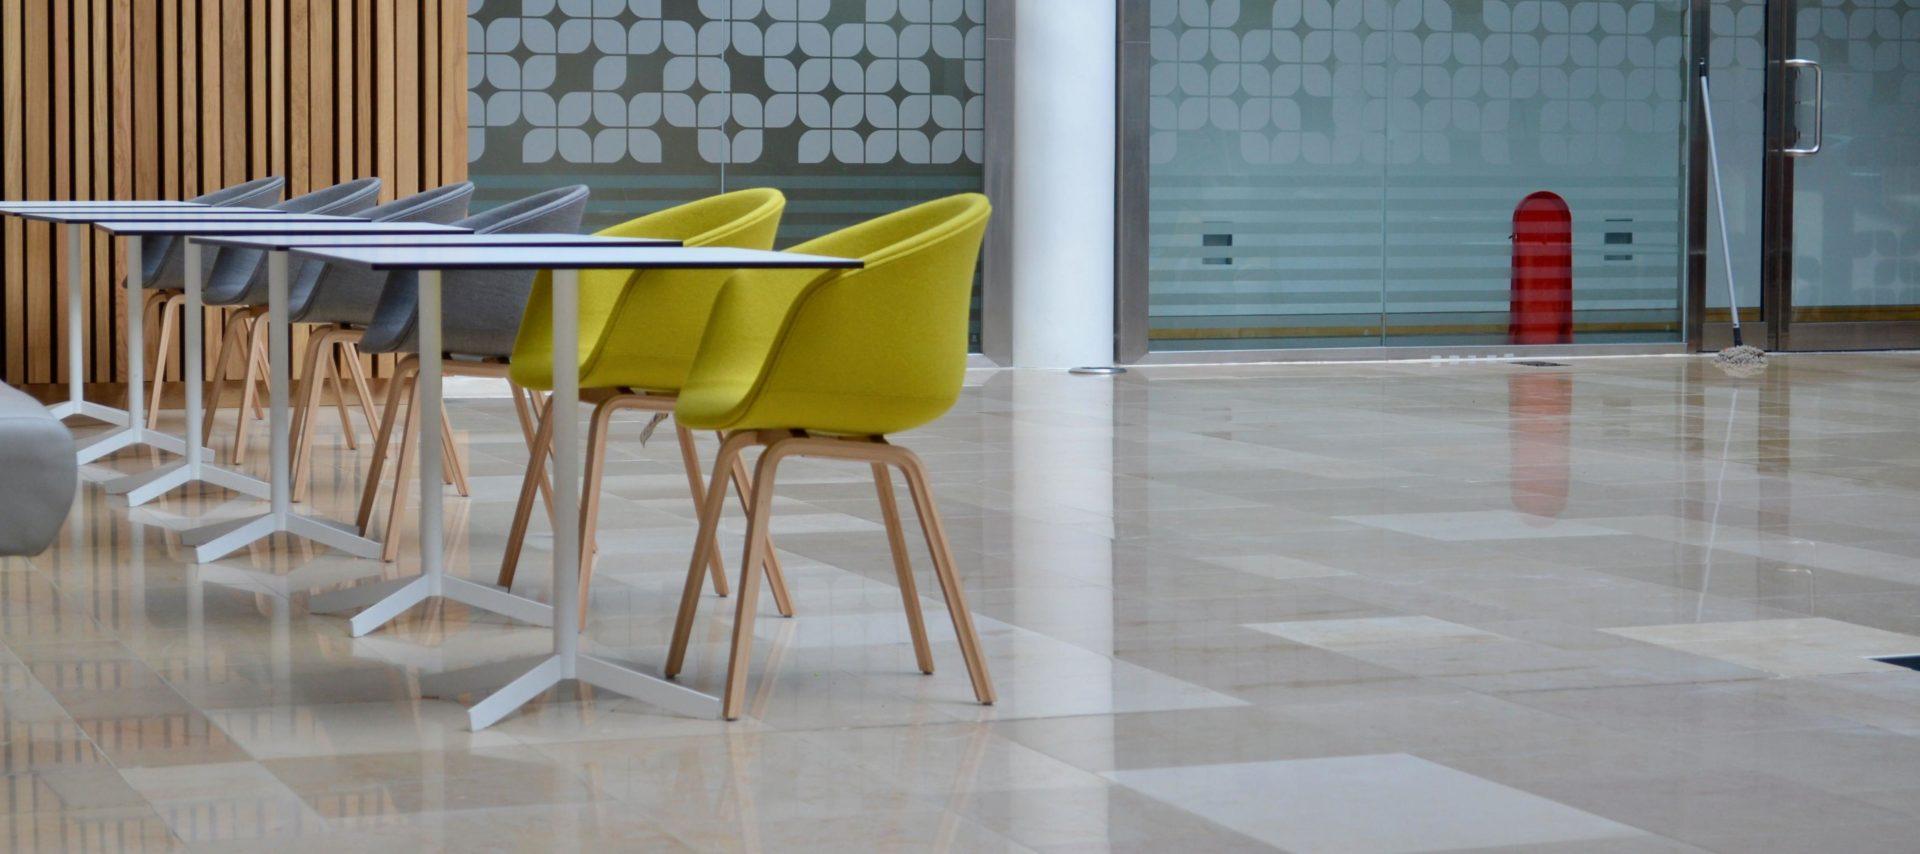 Limestone Floor Cleaner, Limestone Floor Maintenance, Limestone Floor Restoration, Limestone Floor Cleaner, Ascot, Berkshire, Surrey, Sussex, Hampshire, Kent